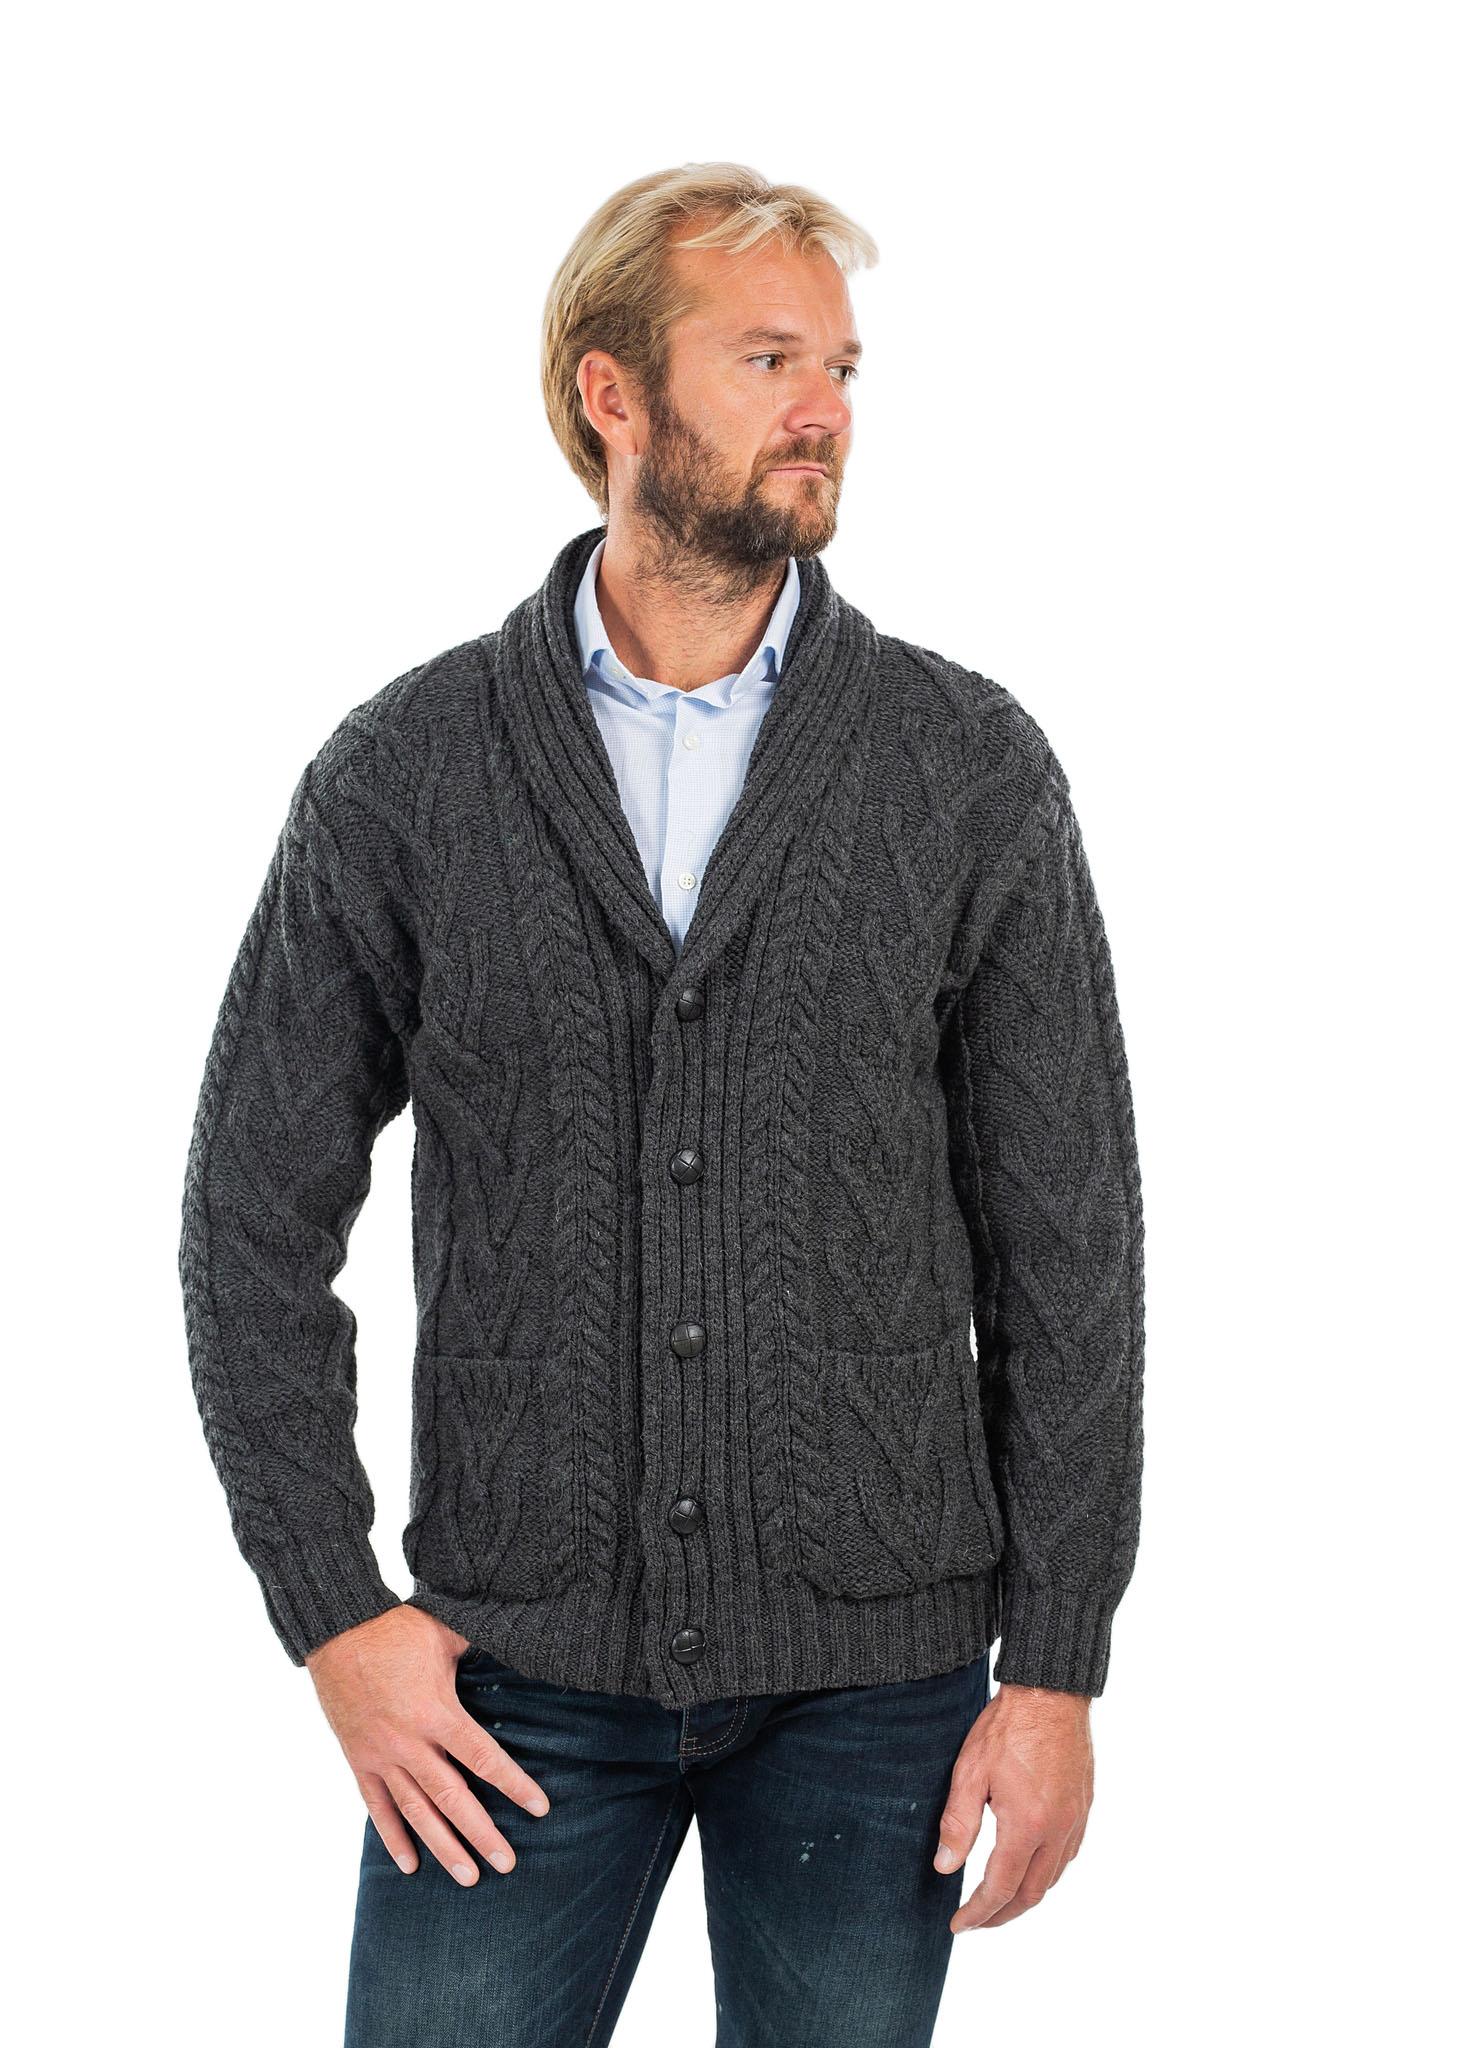 SAOL-Mens-Irish-Merino-Wool-Cardigan-Shawl-Collar-Front-Pockets-Aran-Cable-Knit thumbnail 32